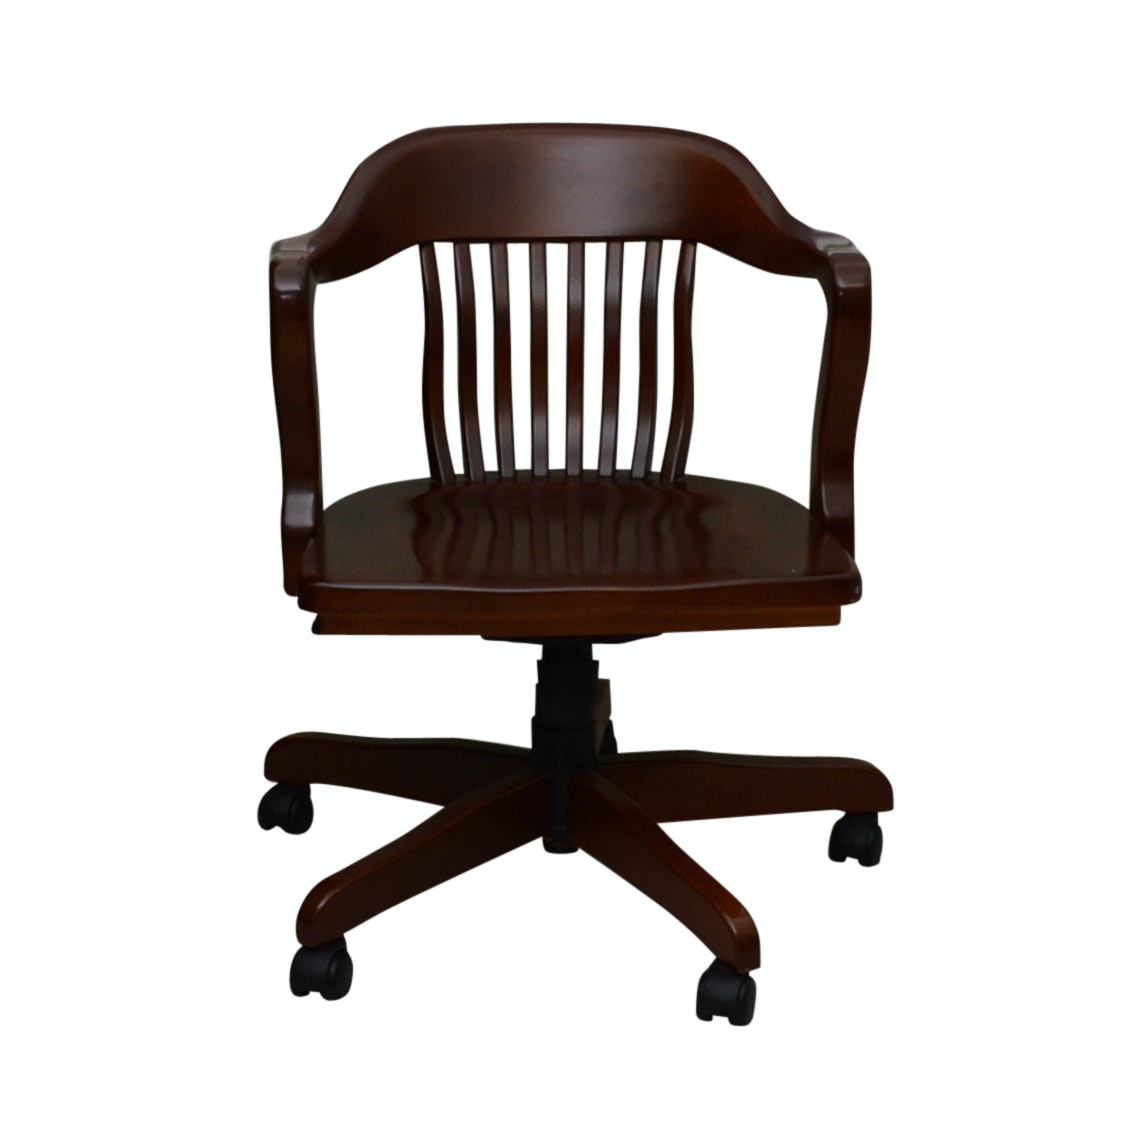 Mission Style Mahogany Finish Swivel Office Chair, 20th Century